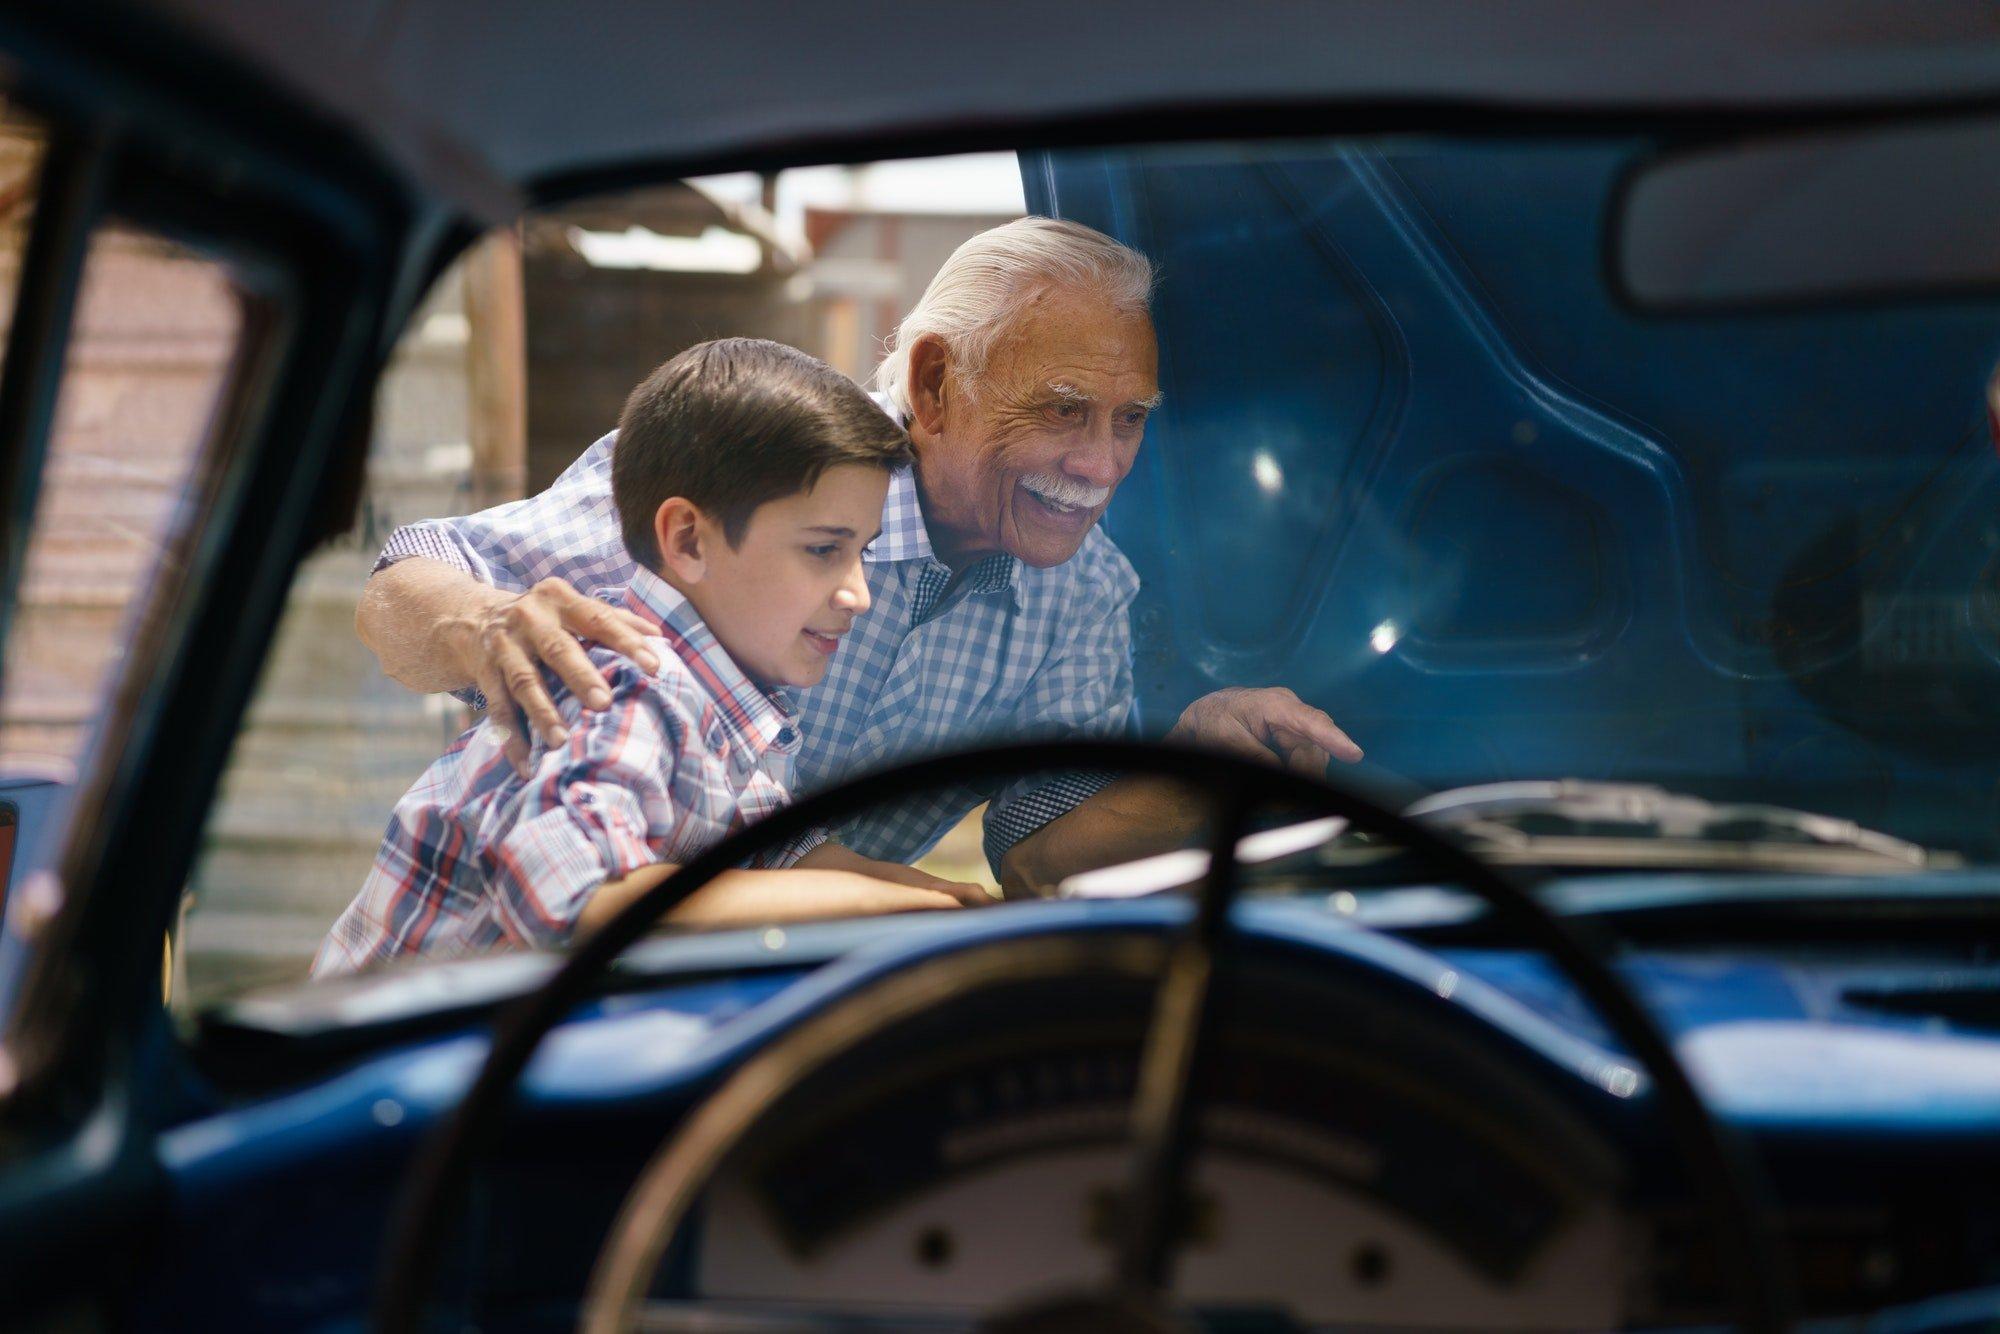 Boy With Grandpa Looking Car Engine Of Senior Man